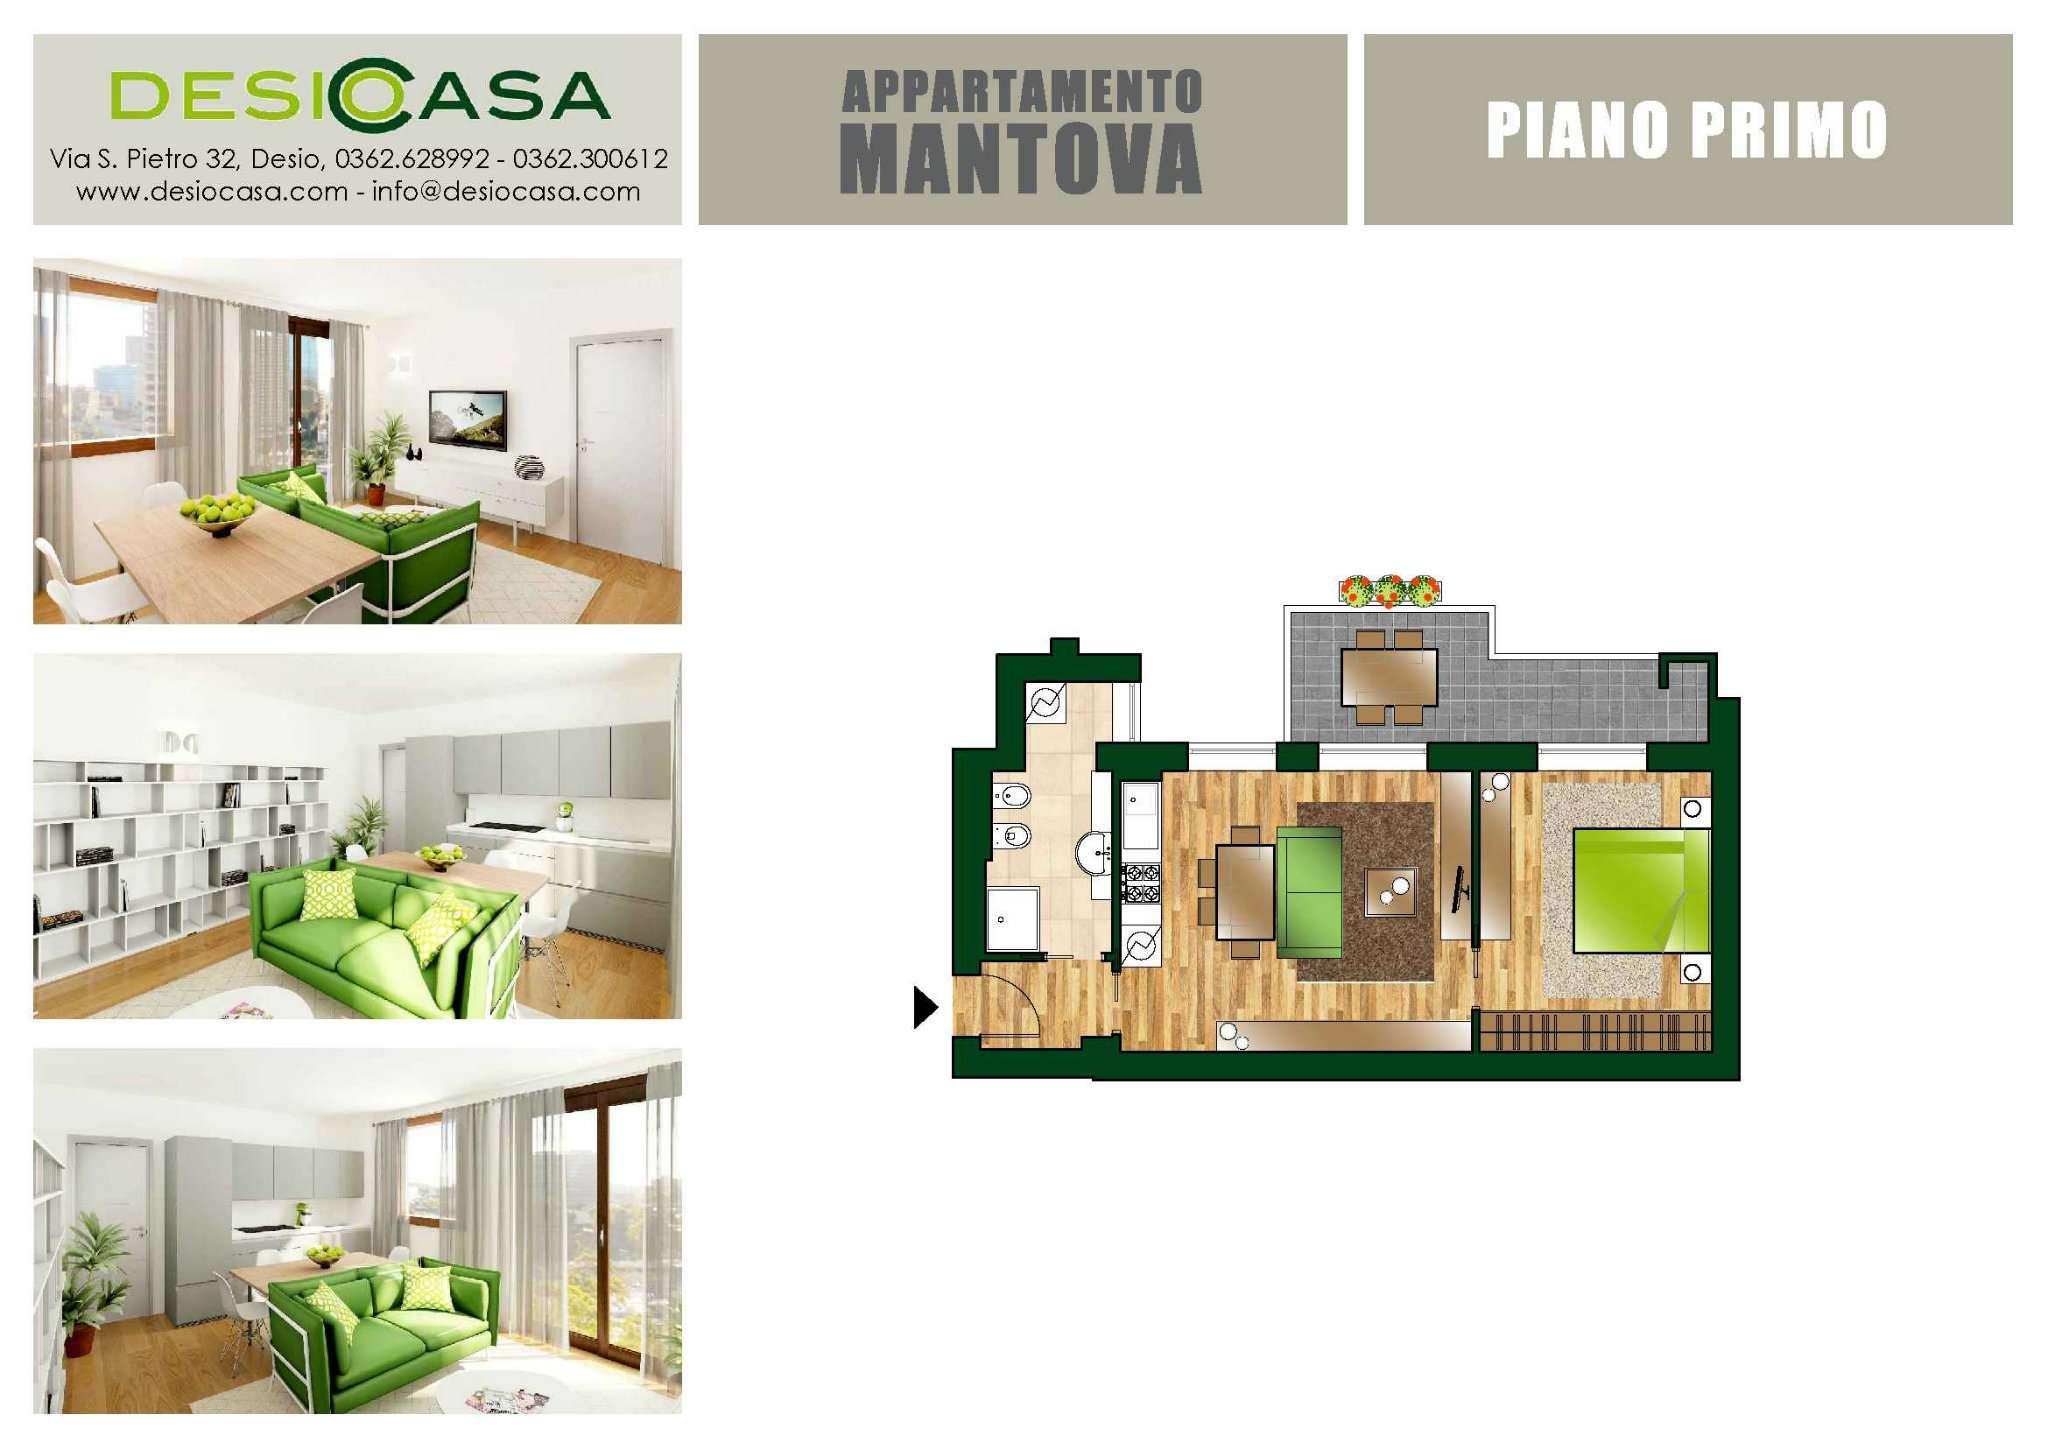 Vendita  bilocale Desio Via Mantova 1 931248